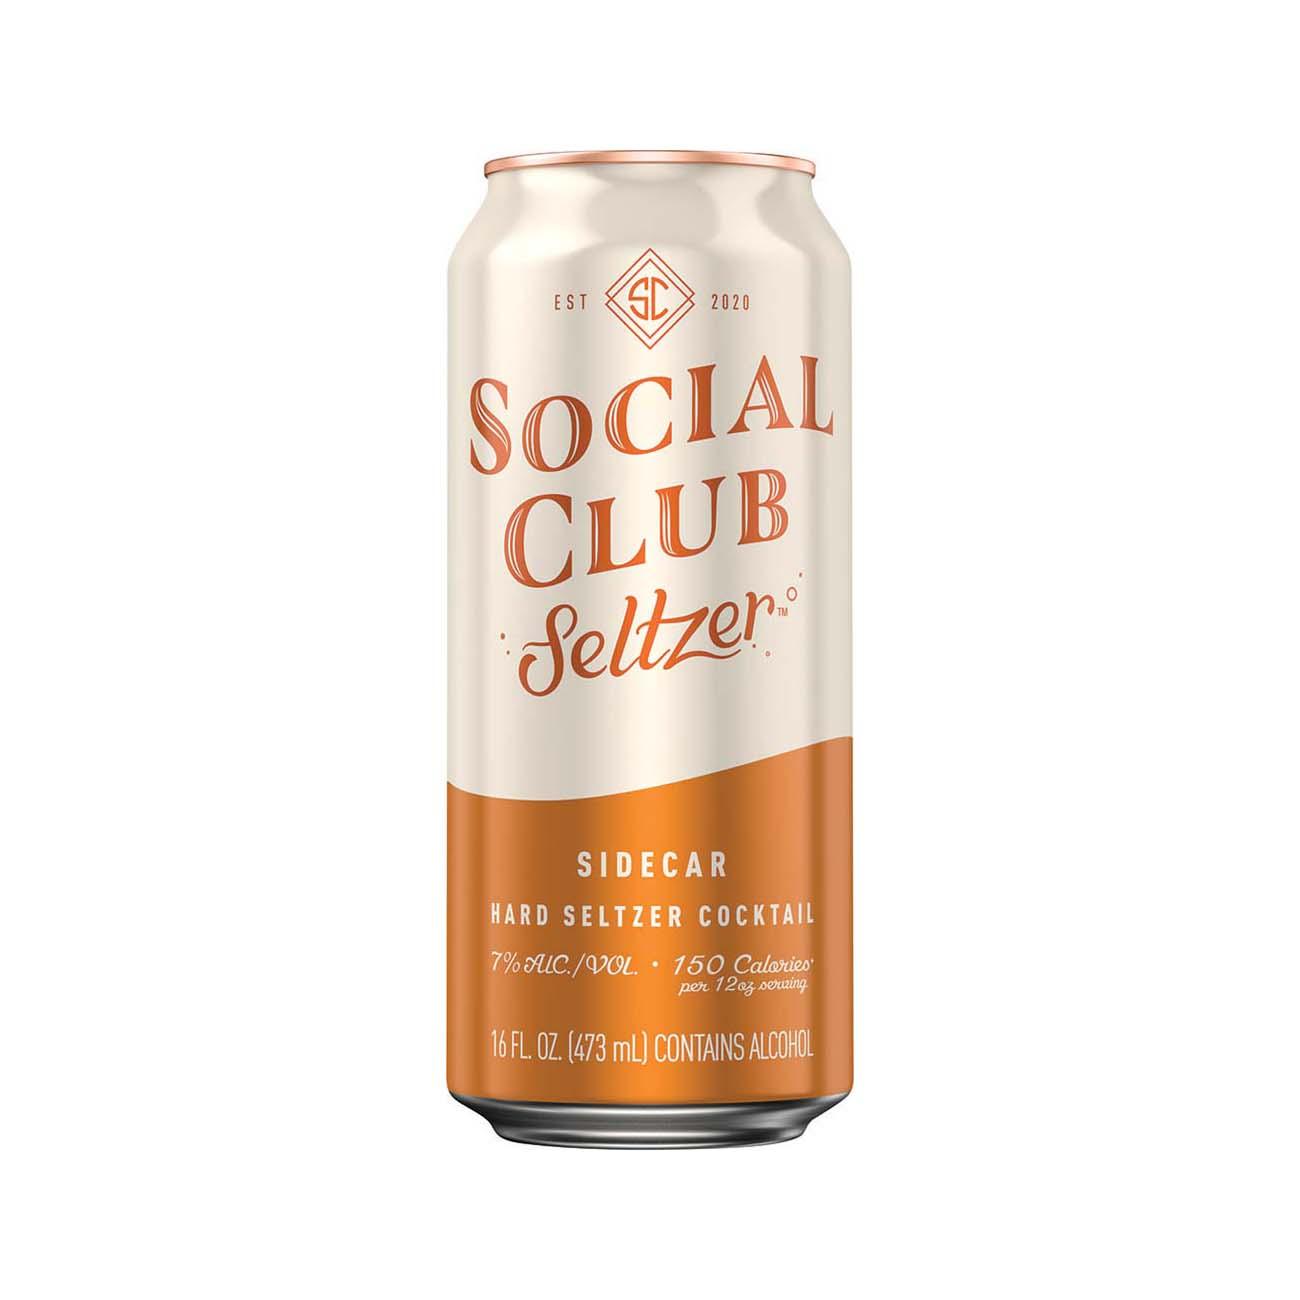 Social Club Seltzer, Side Car